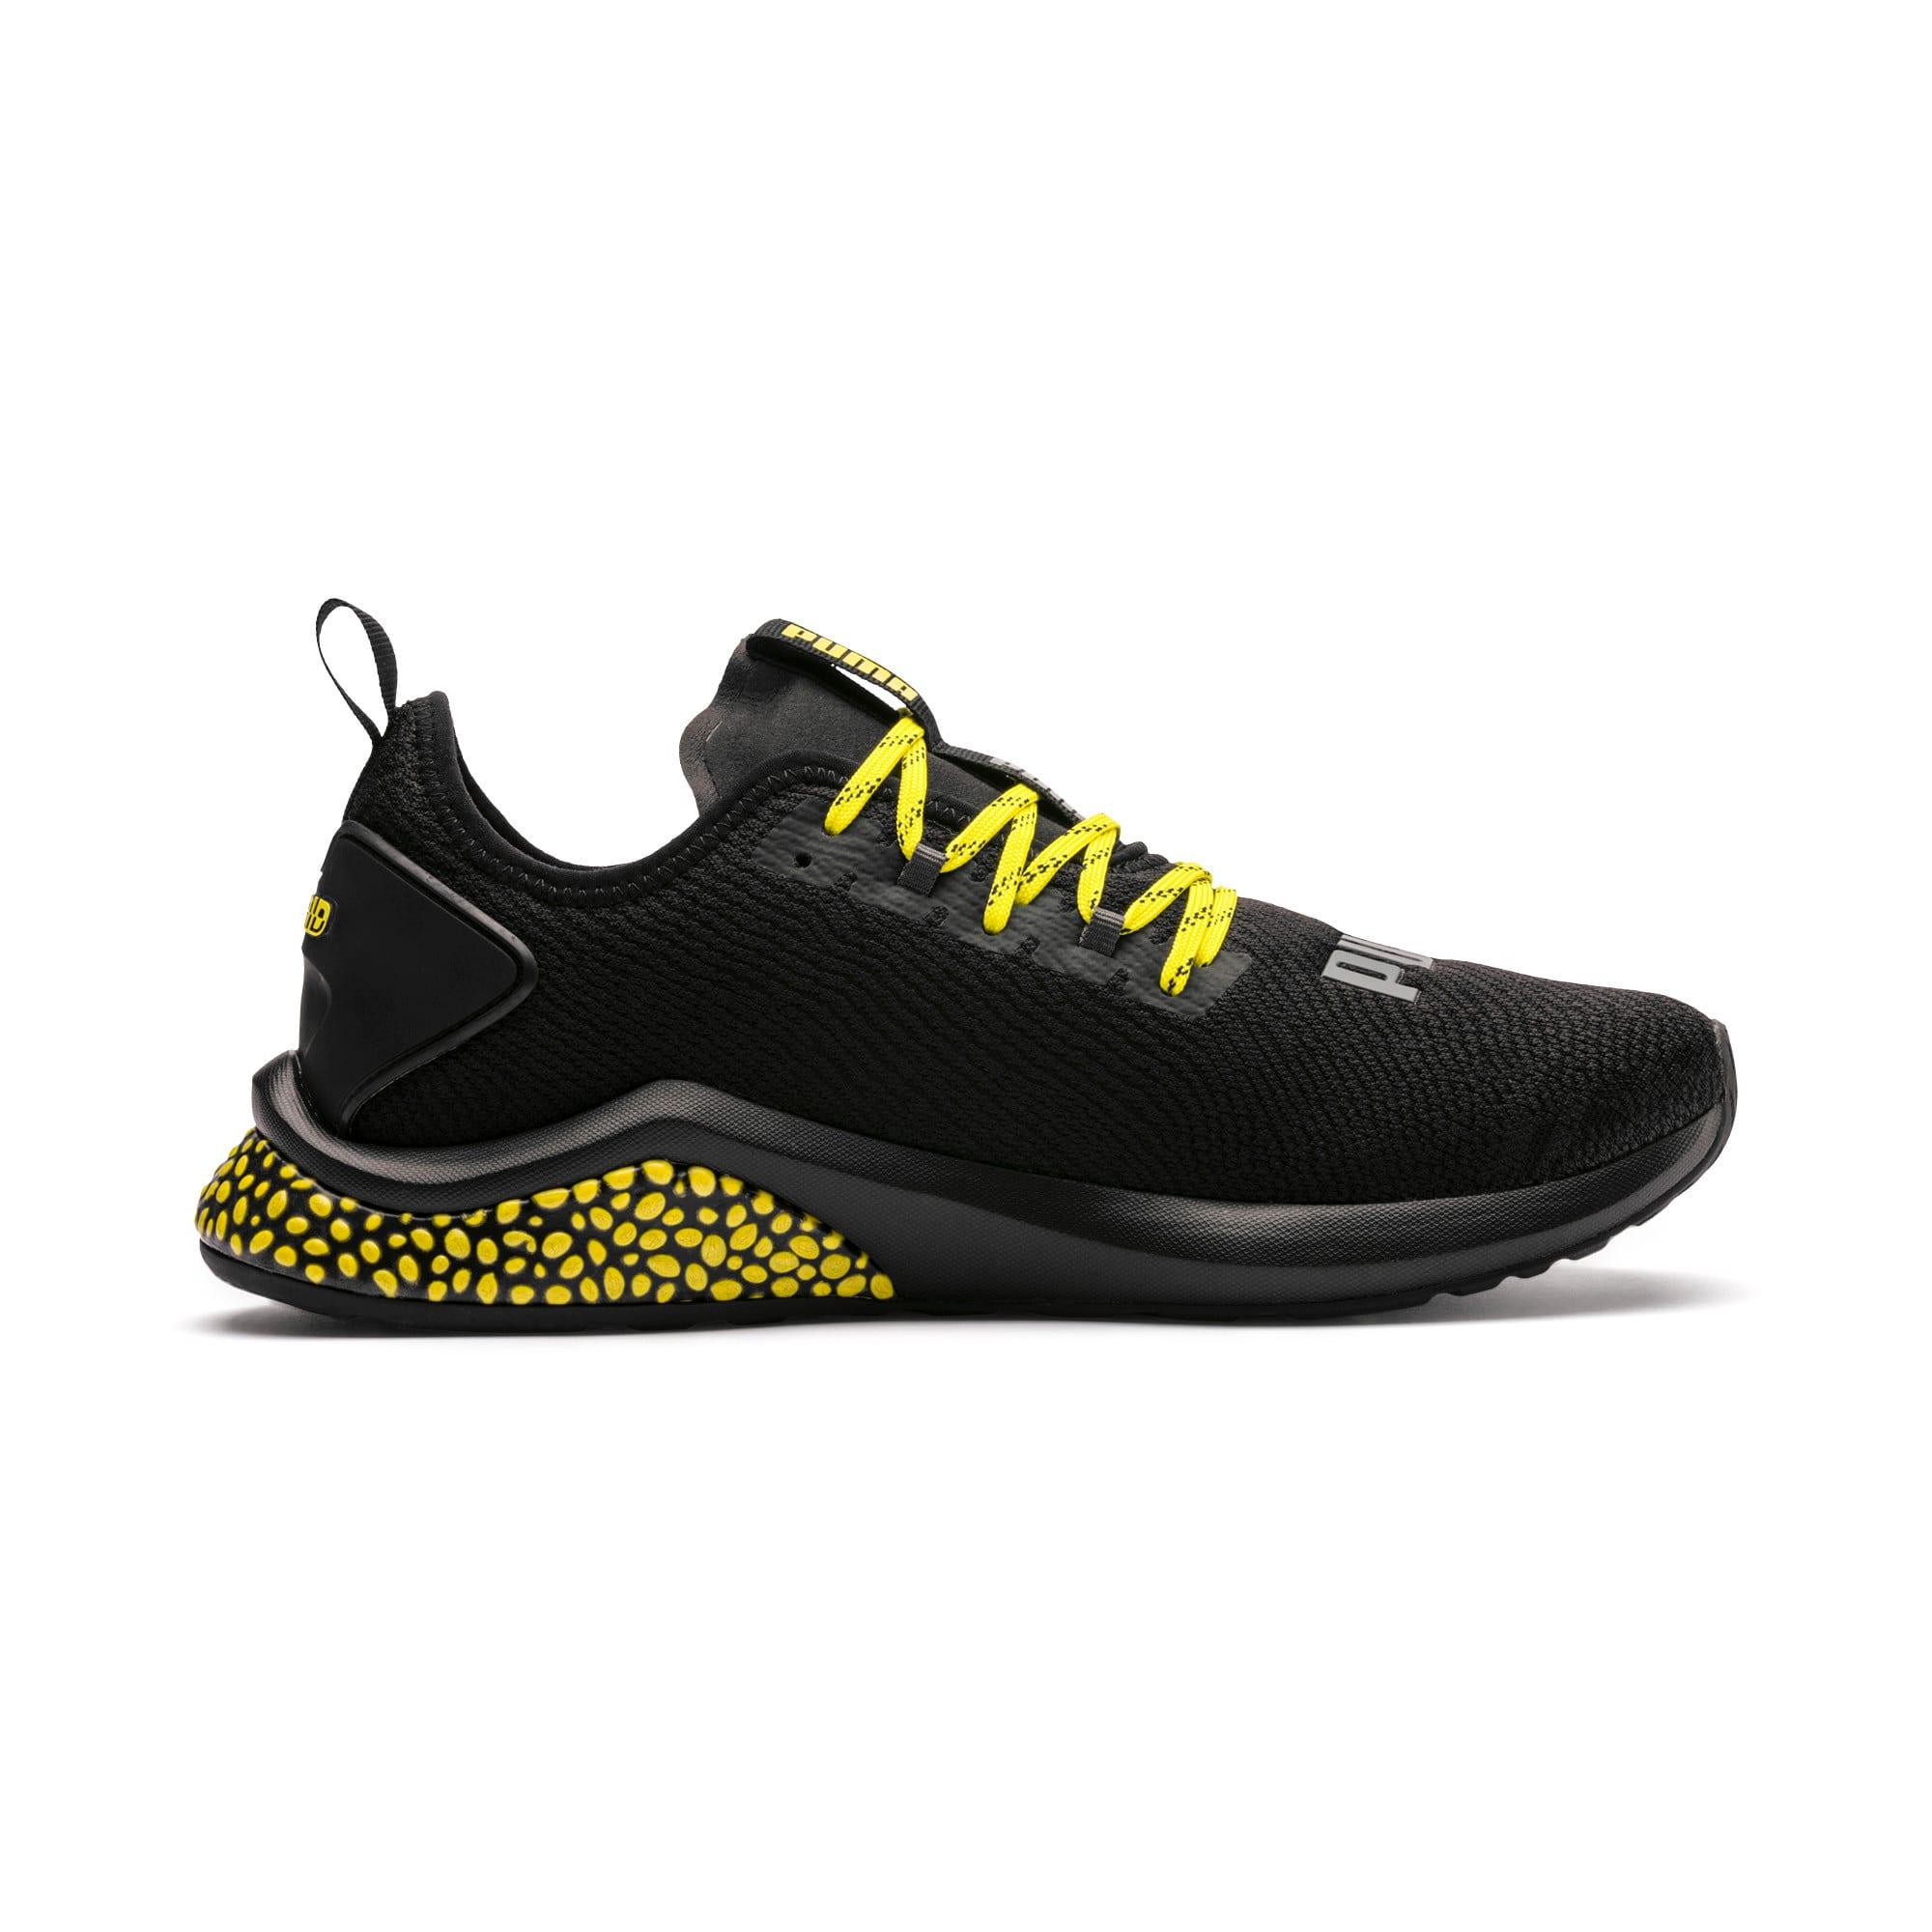 Thumbnail 5 of HYBRID NX Caution hardloopschoenen voor heren, Puma Black-Blazing Yellow, medium